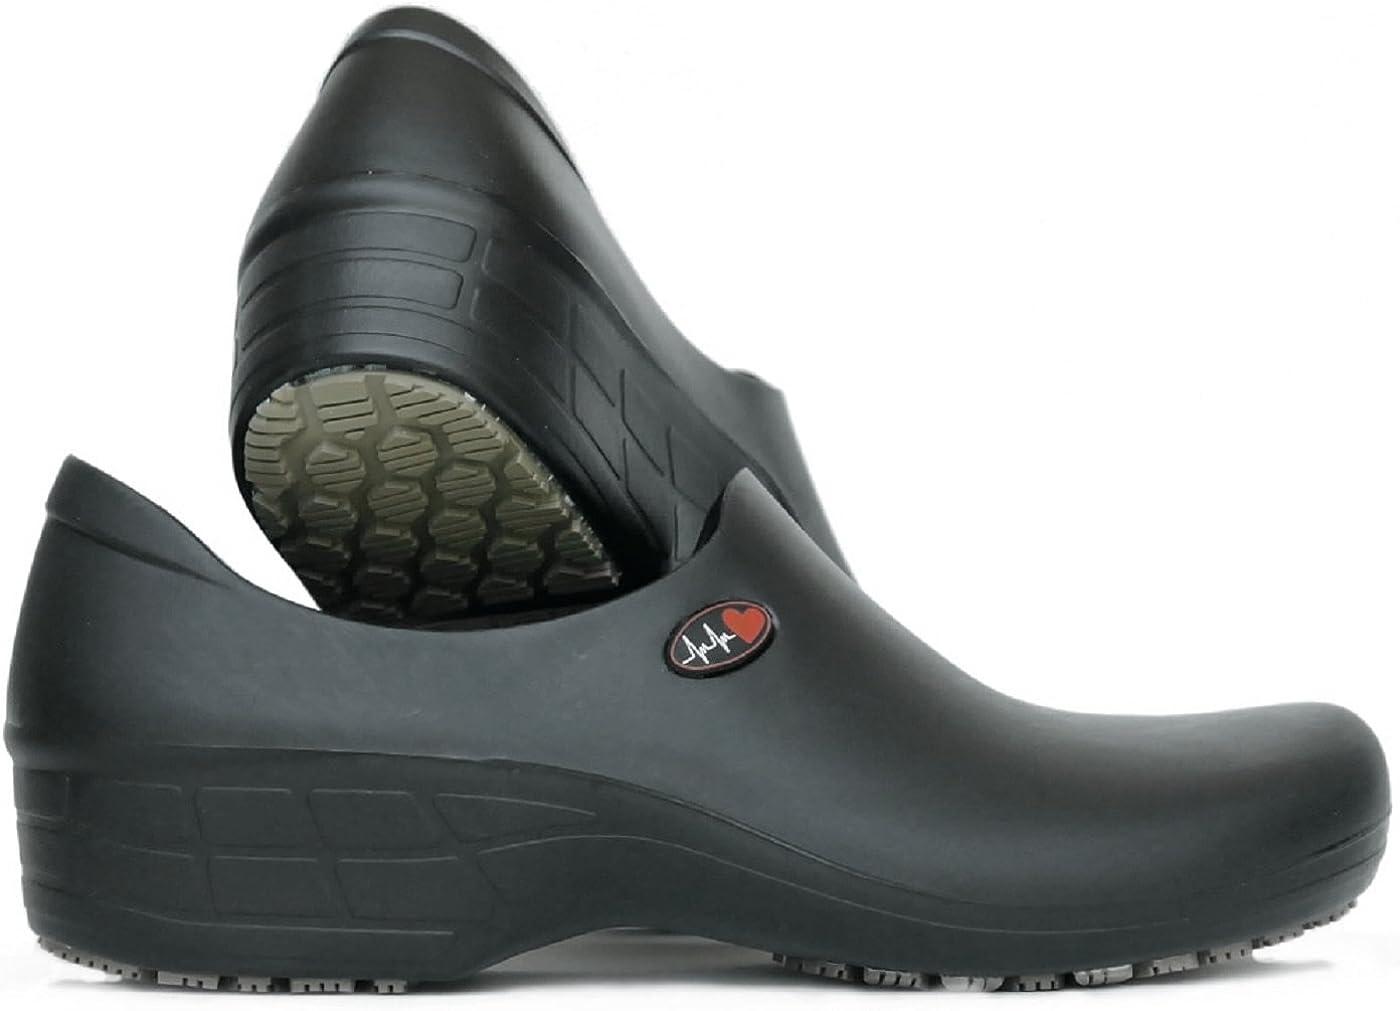 Amazon.com: Sticky Pro Shoes - Women's